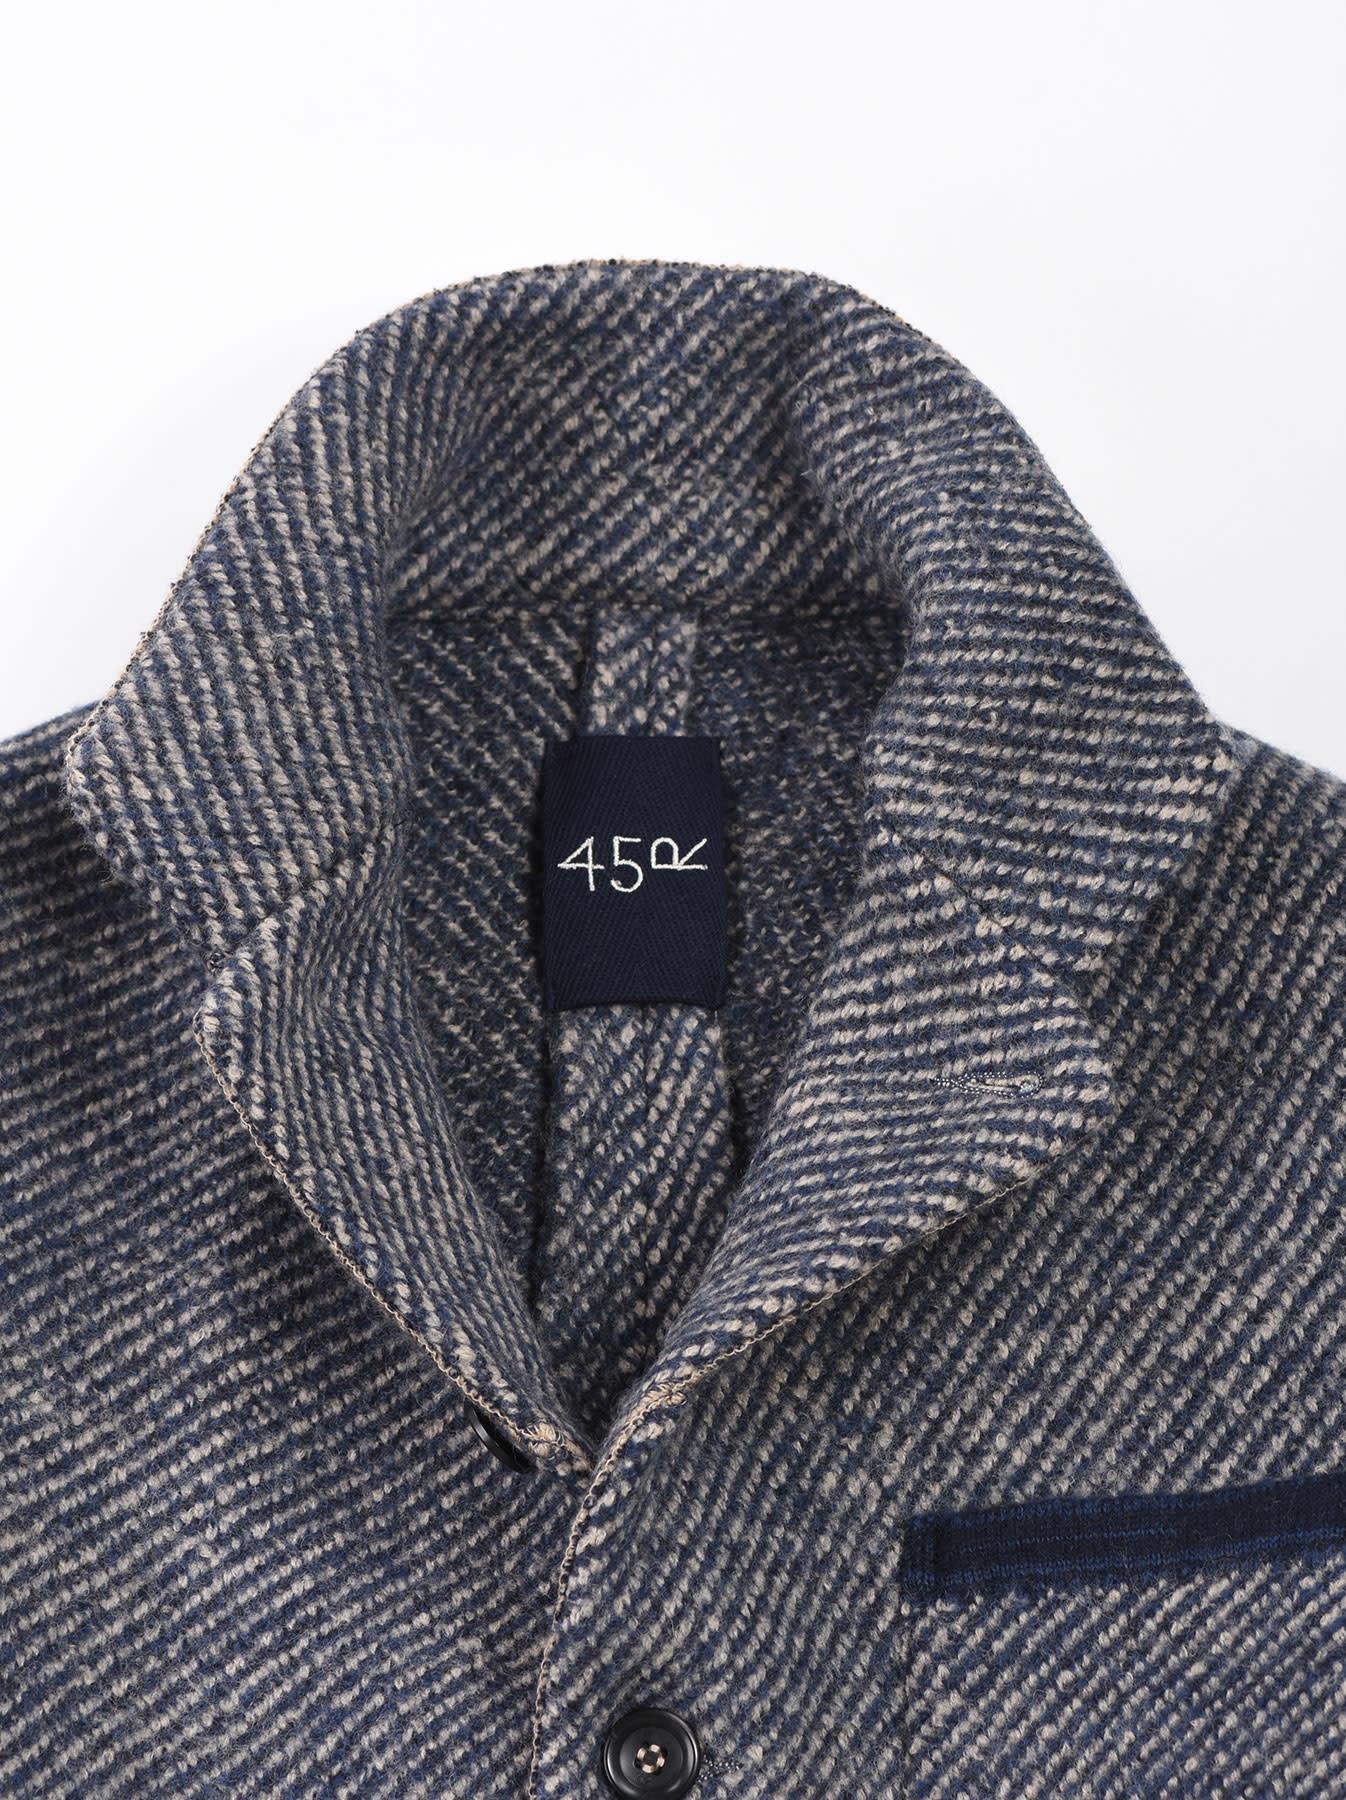 Denim Tweed Knit Jacket-7